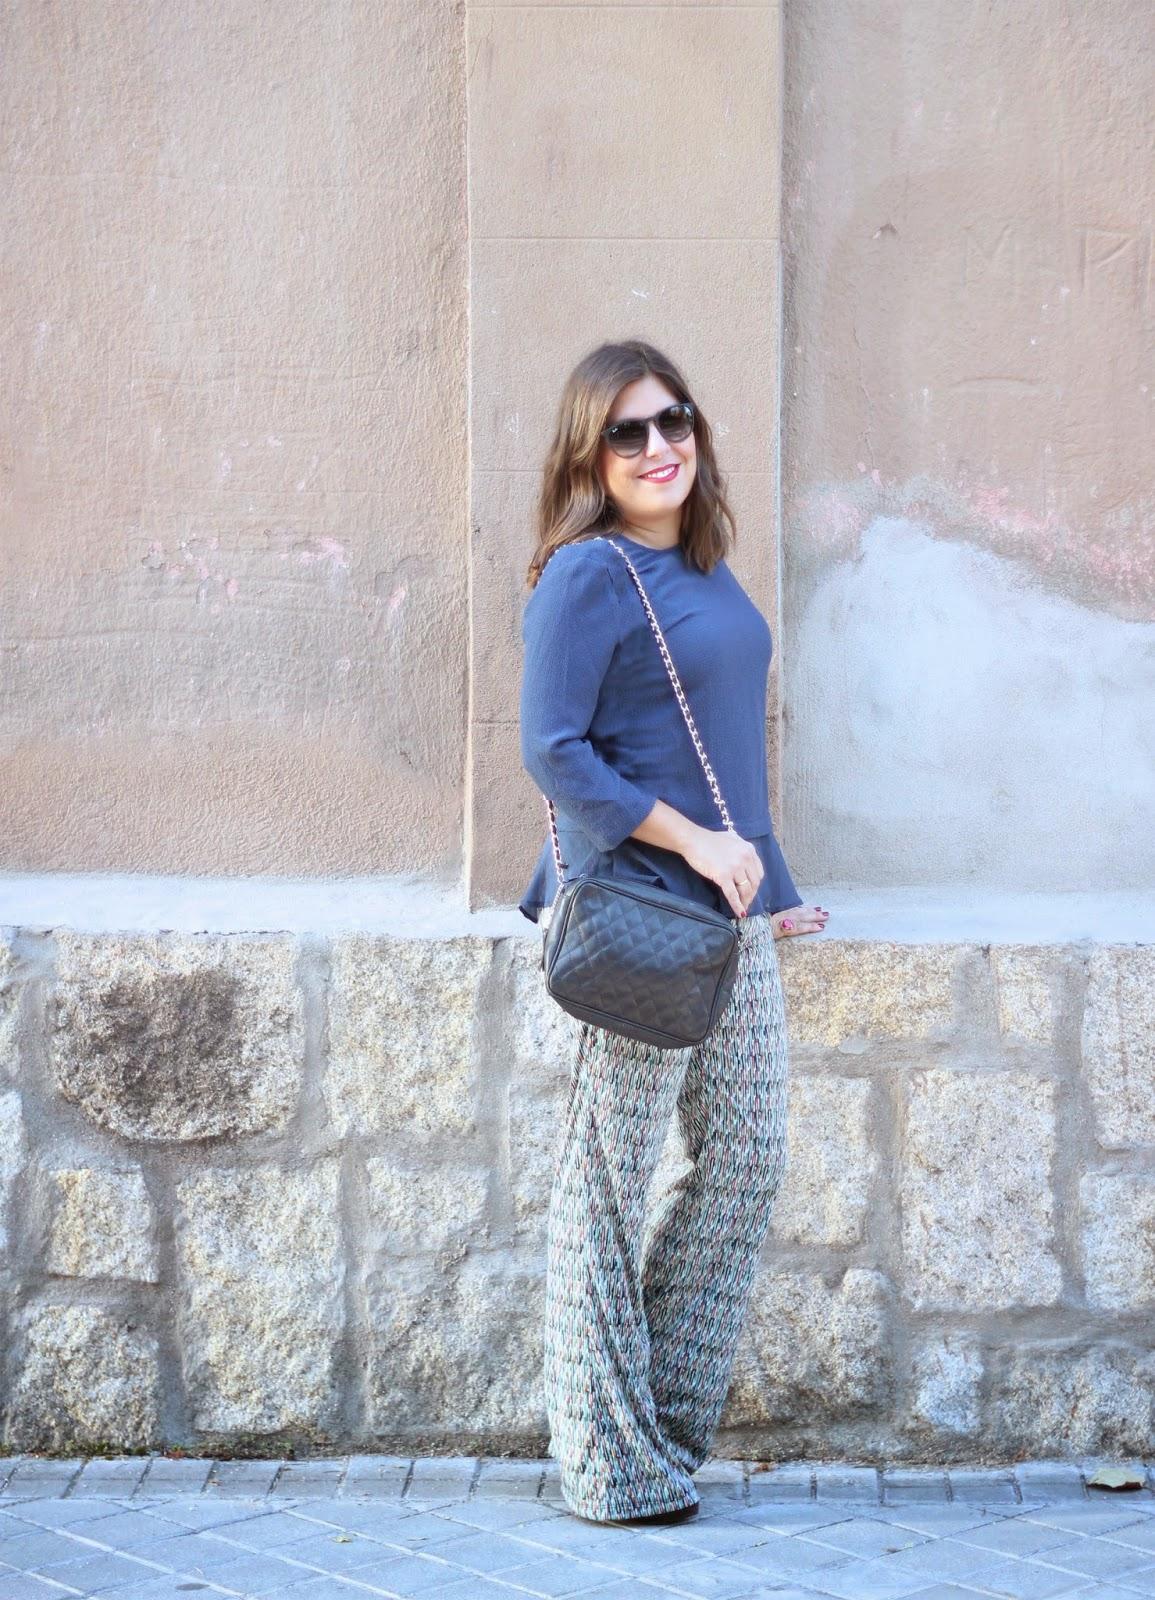 photo-look-street_style-nicoli-pantalones-camisa_azul-zara